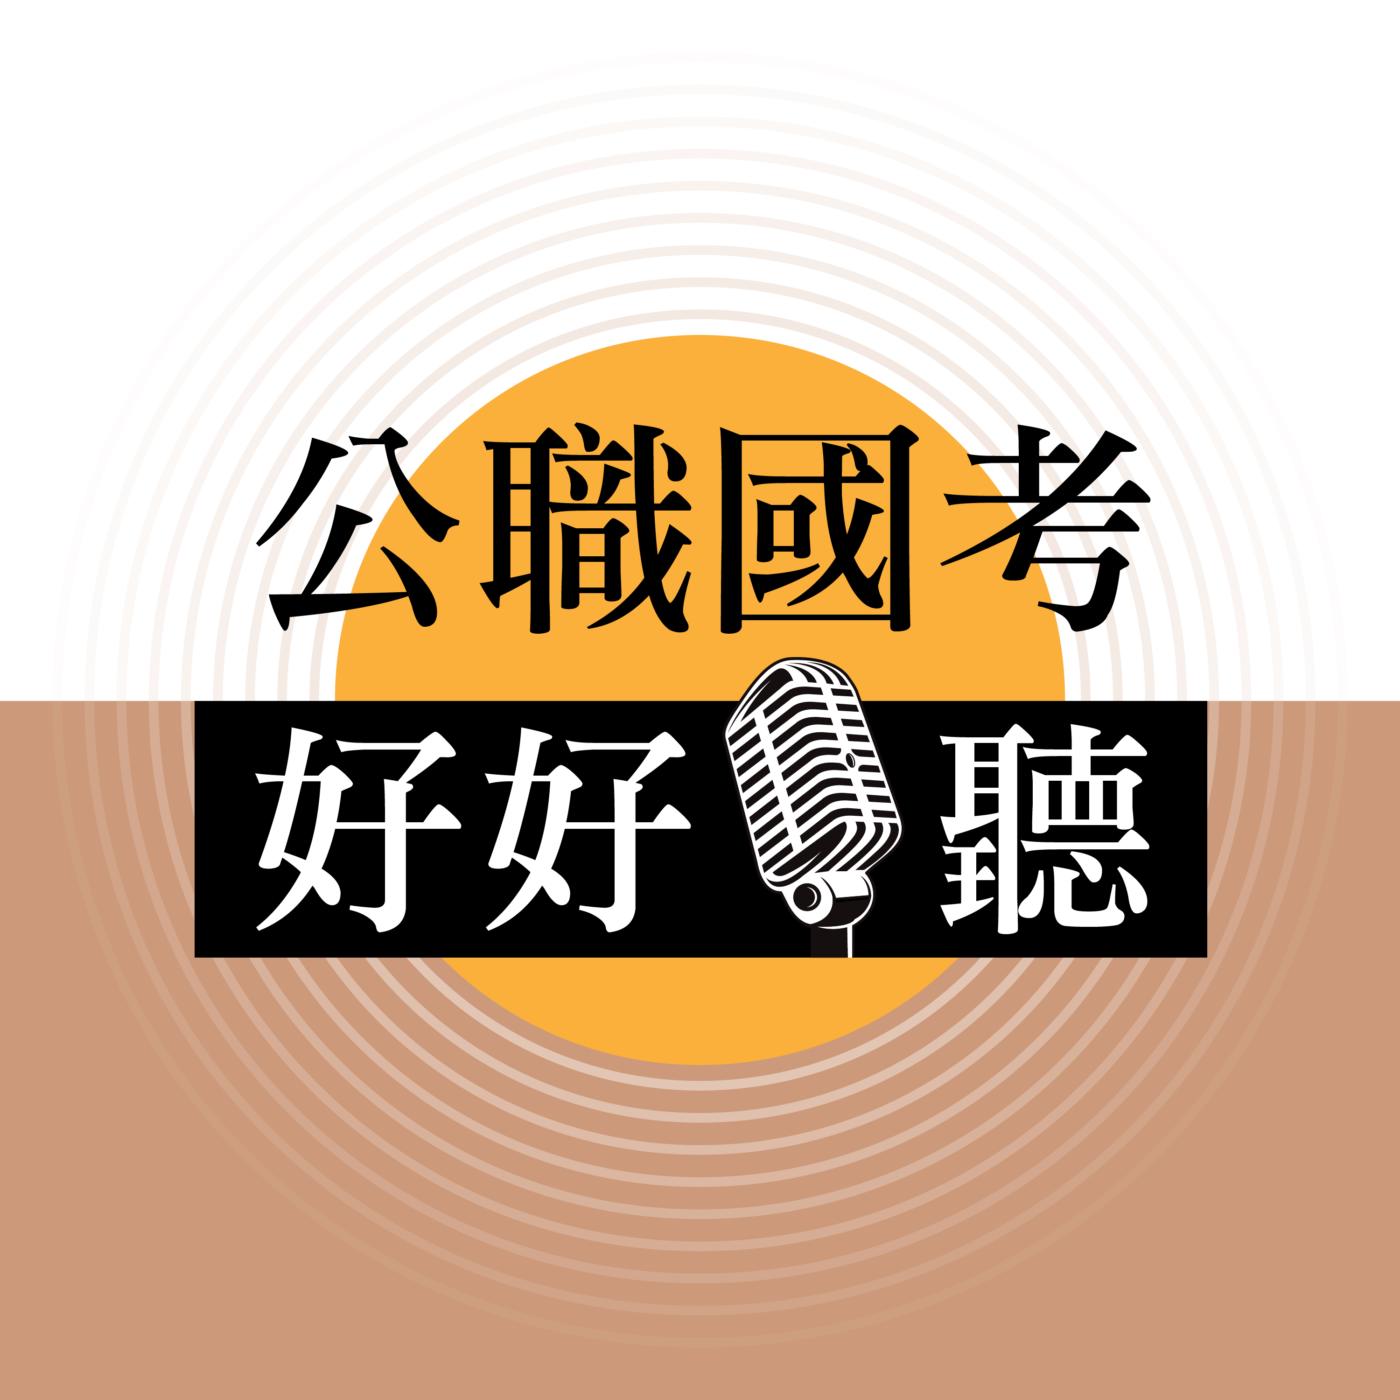 Ep.2 關務特考-行政法爭點解析 feat. 郭羿老師